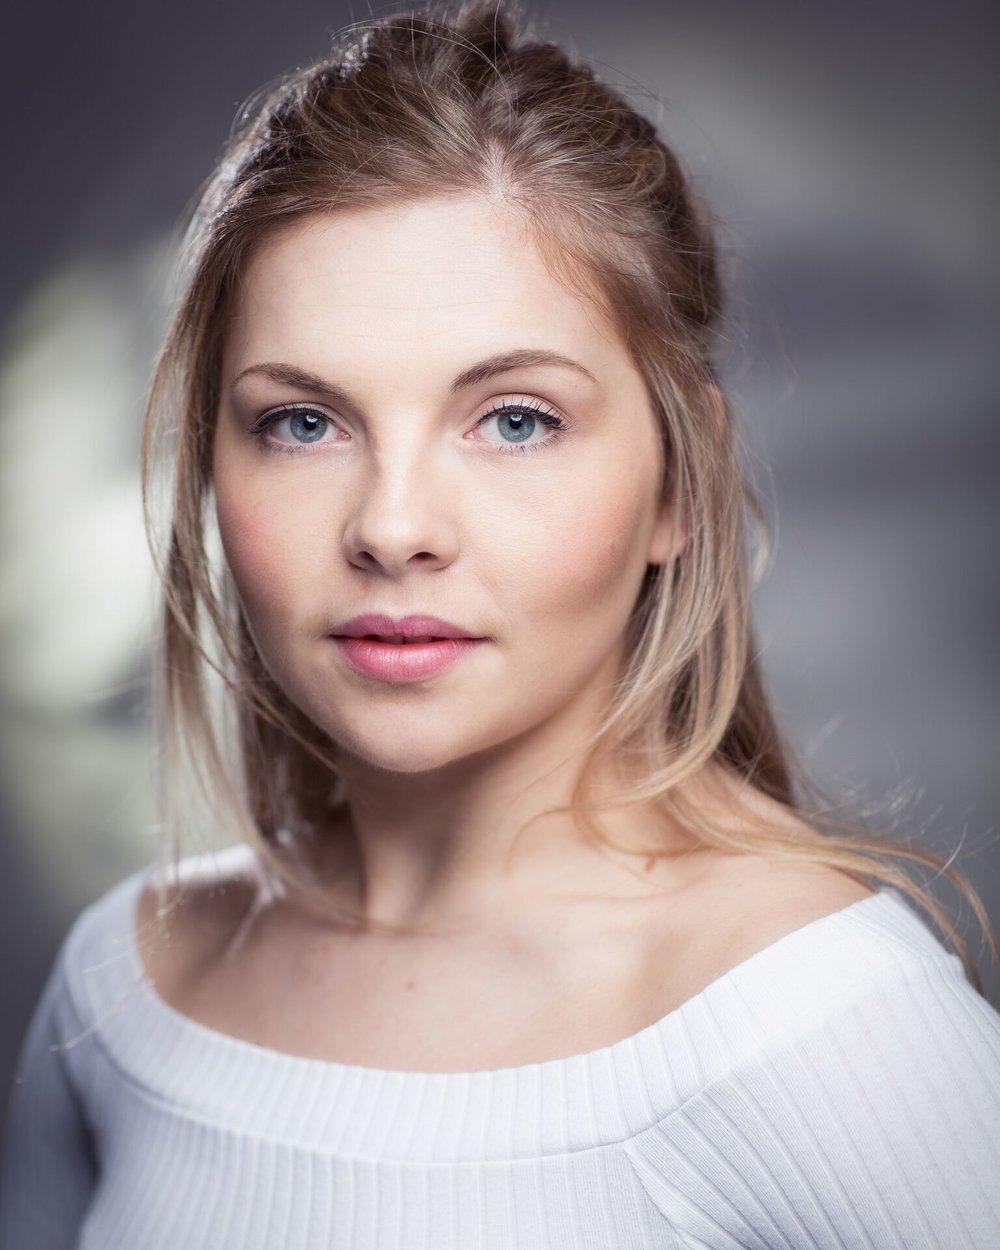 Isobel Haffenden